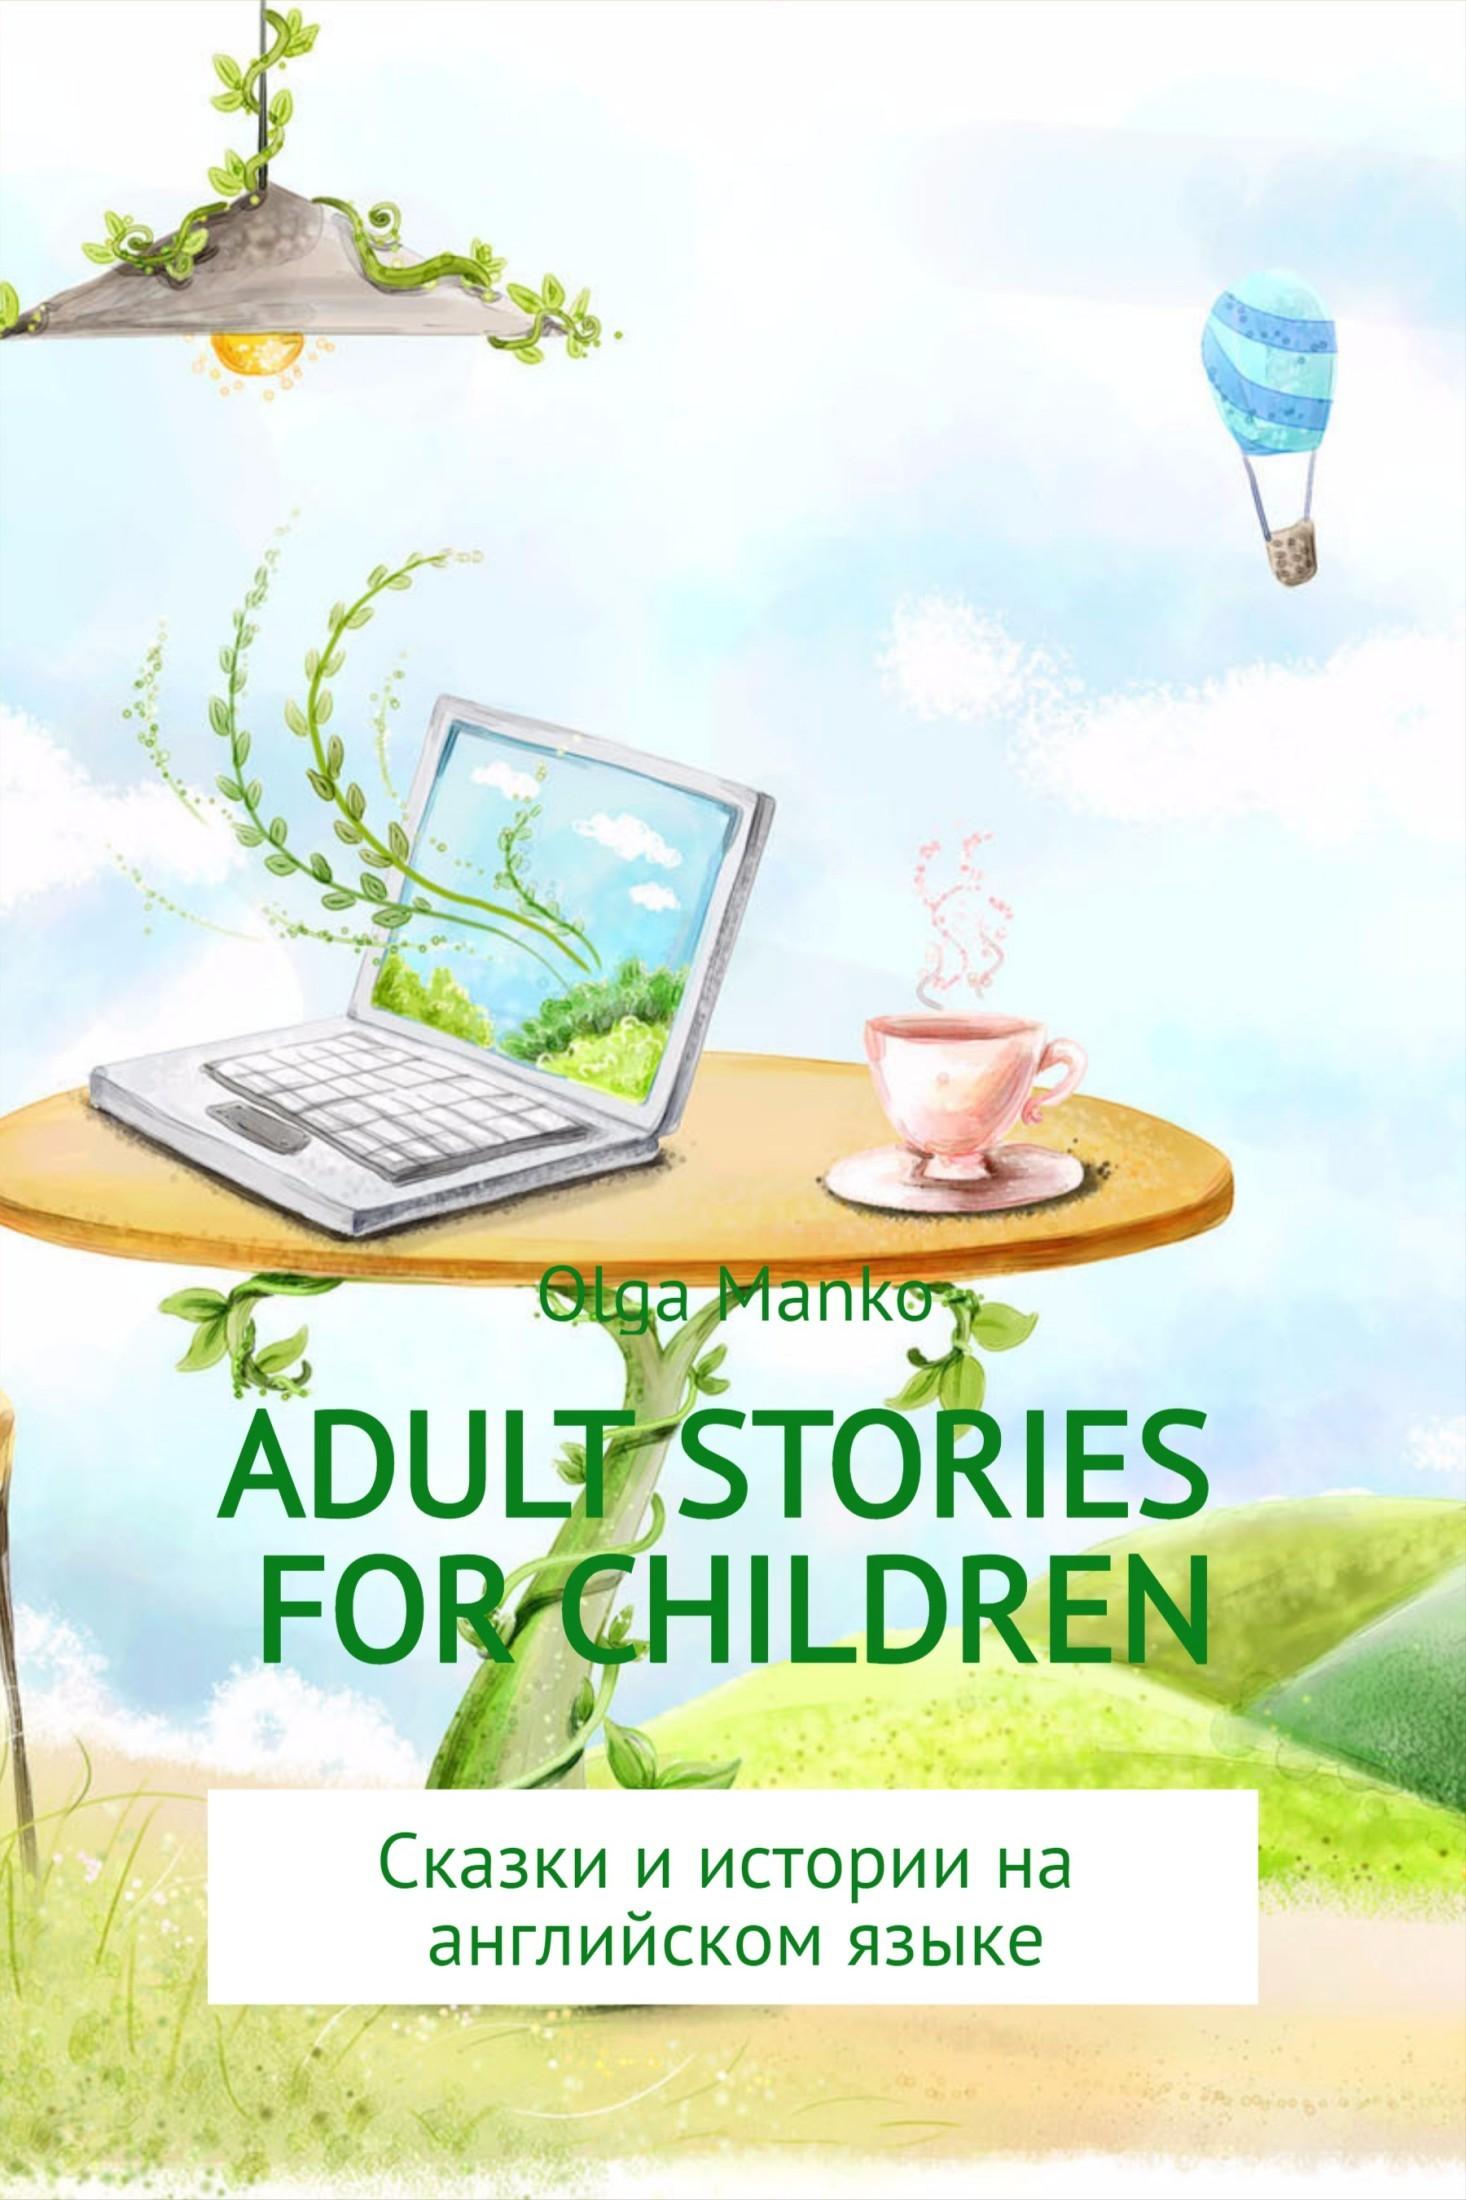 Ольга Владимировна Манько Adult stories for children наталия пенькова детям о звёздах star stories for children